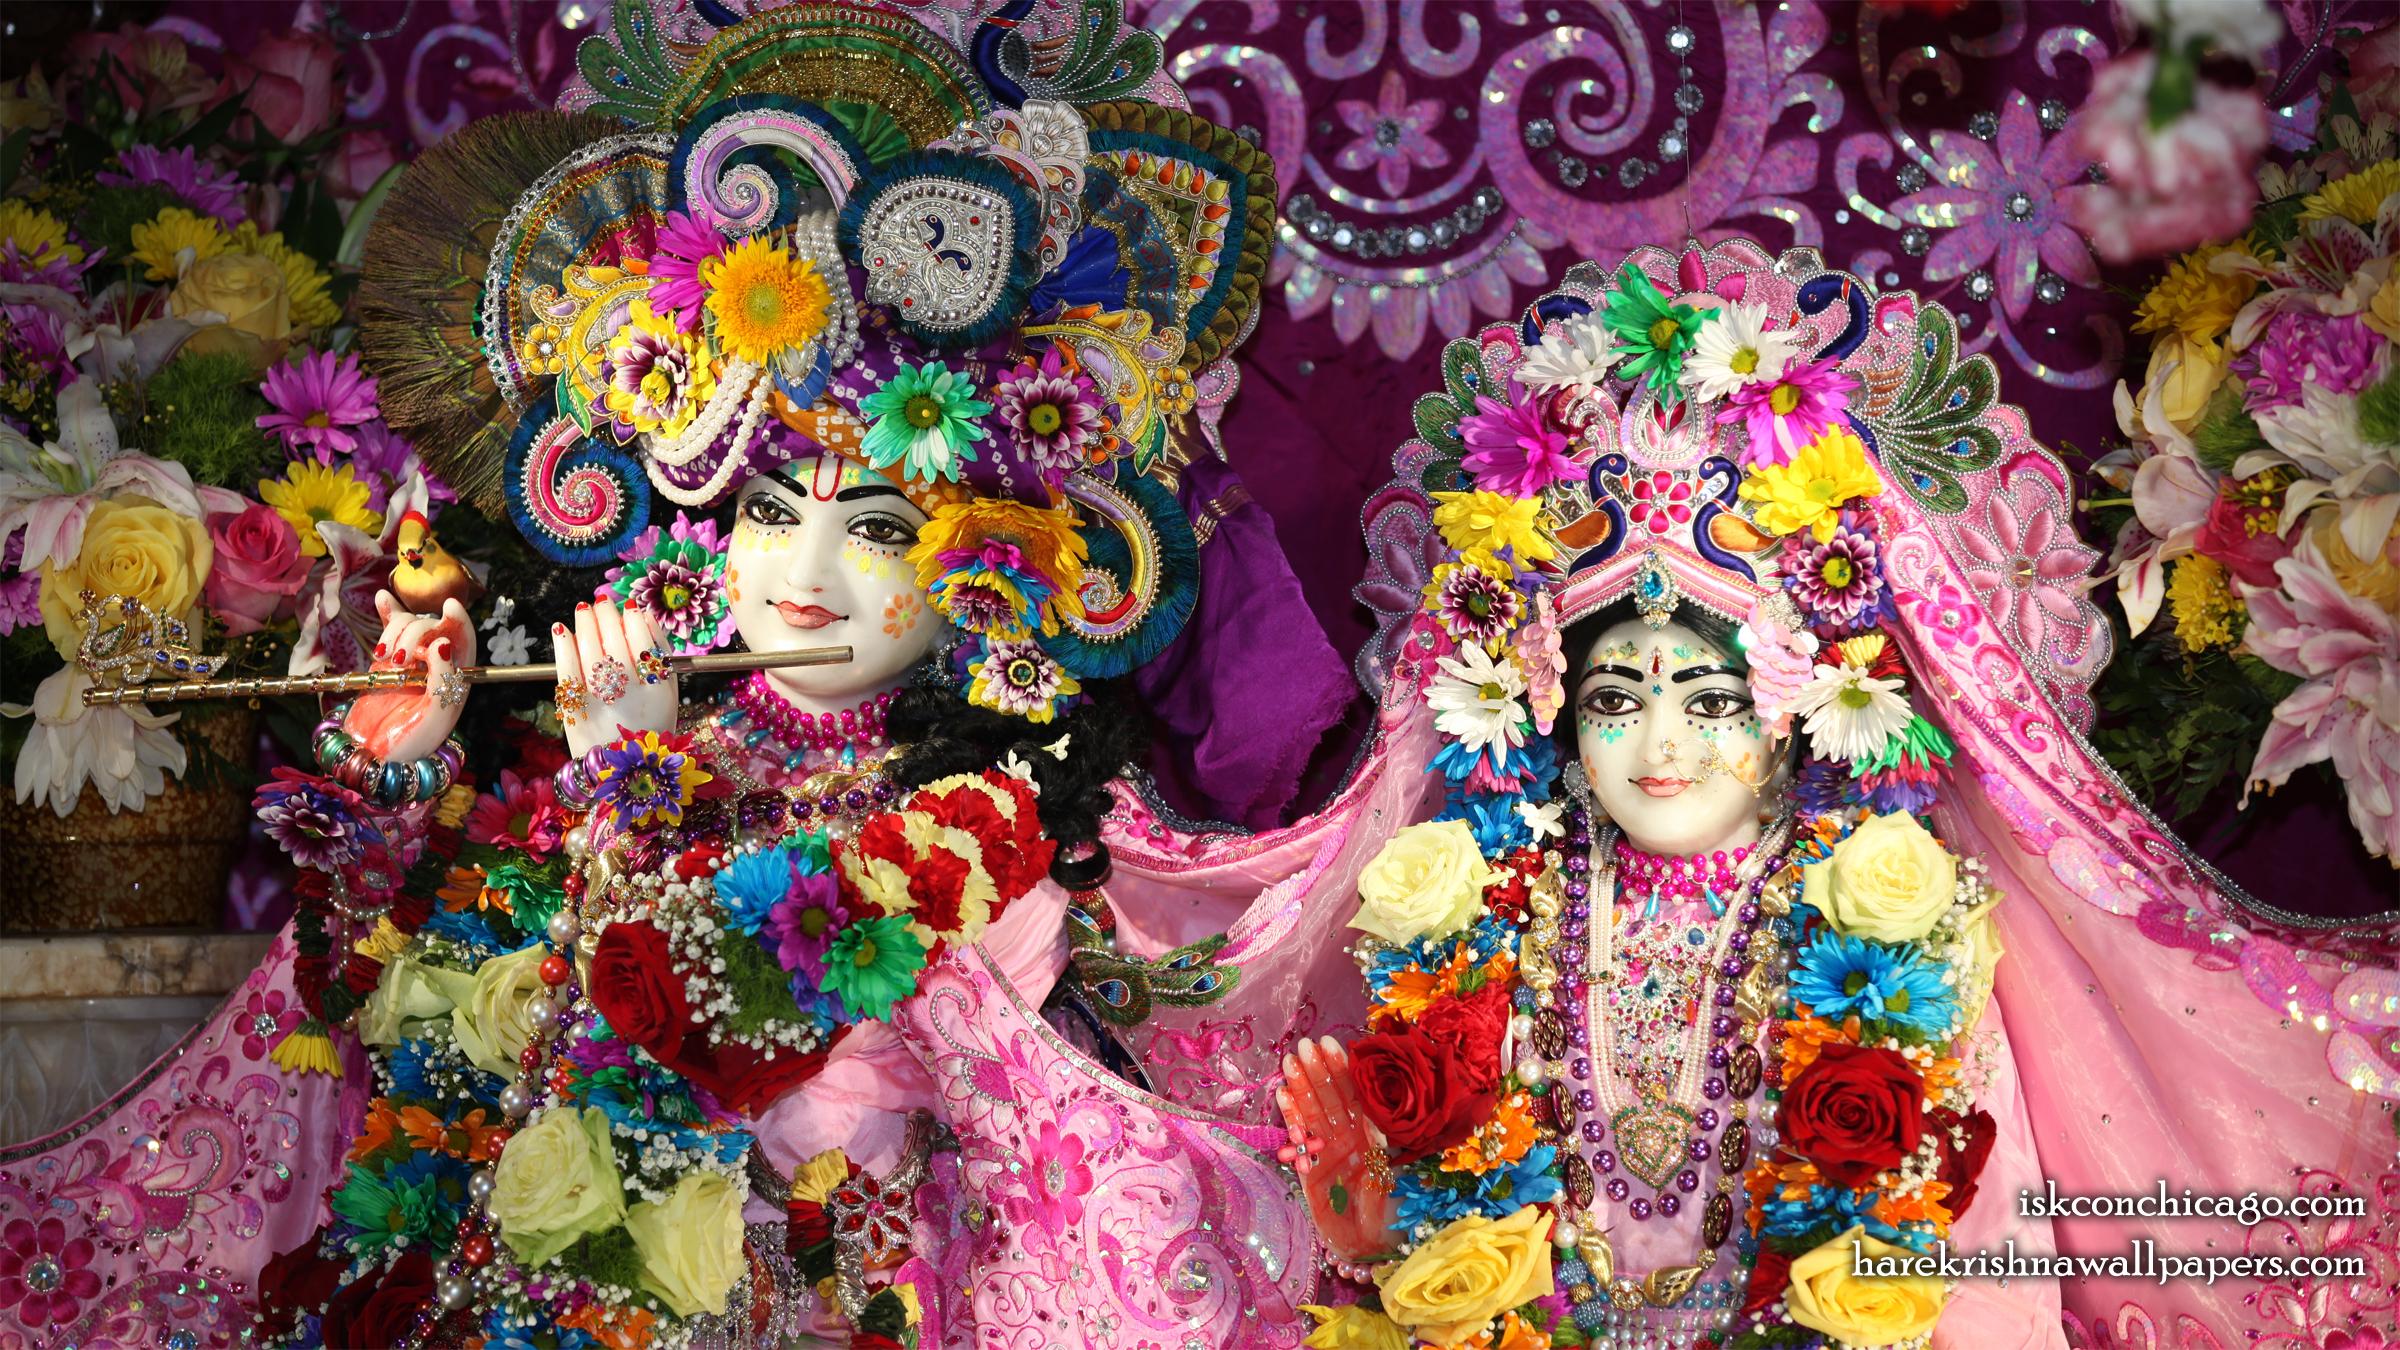 Sri Sri Kishore Kishori Close up Wallpaper (018) Size 2400x1350 Download